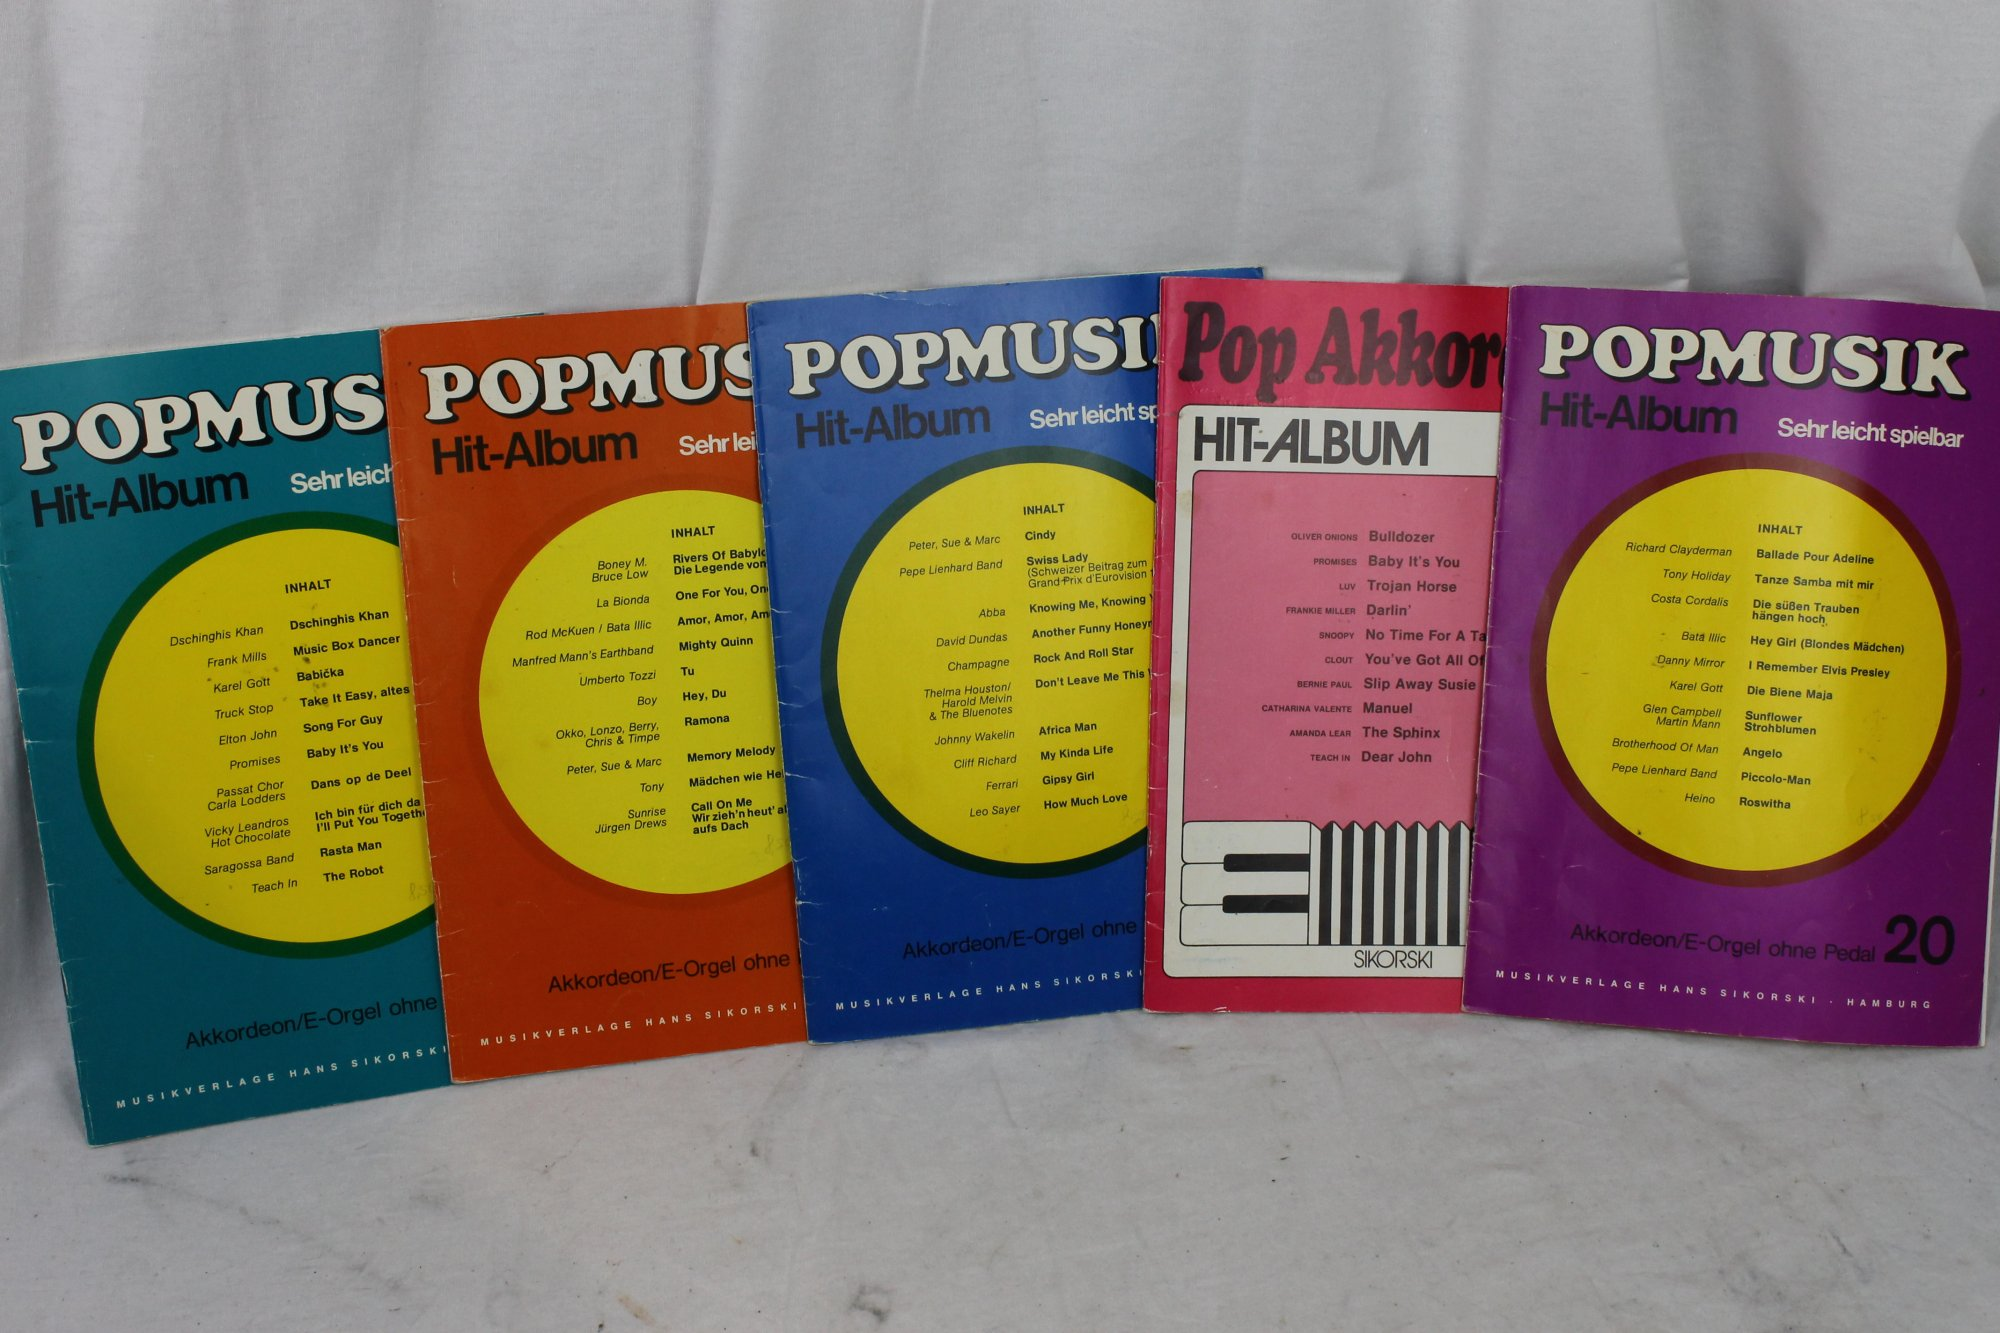 Lot of Used Accordion / Organ Books - German and International Popular Music